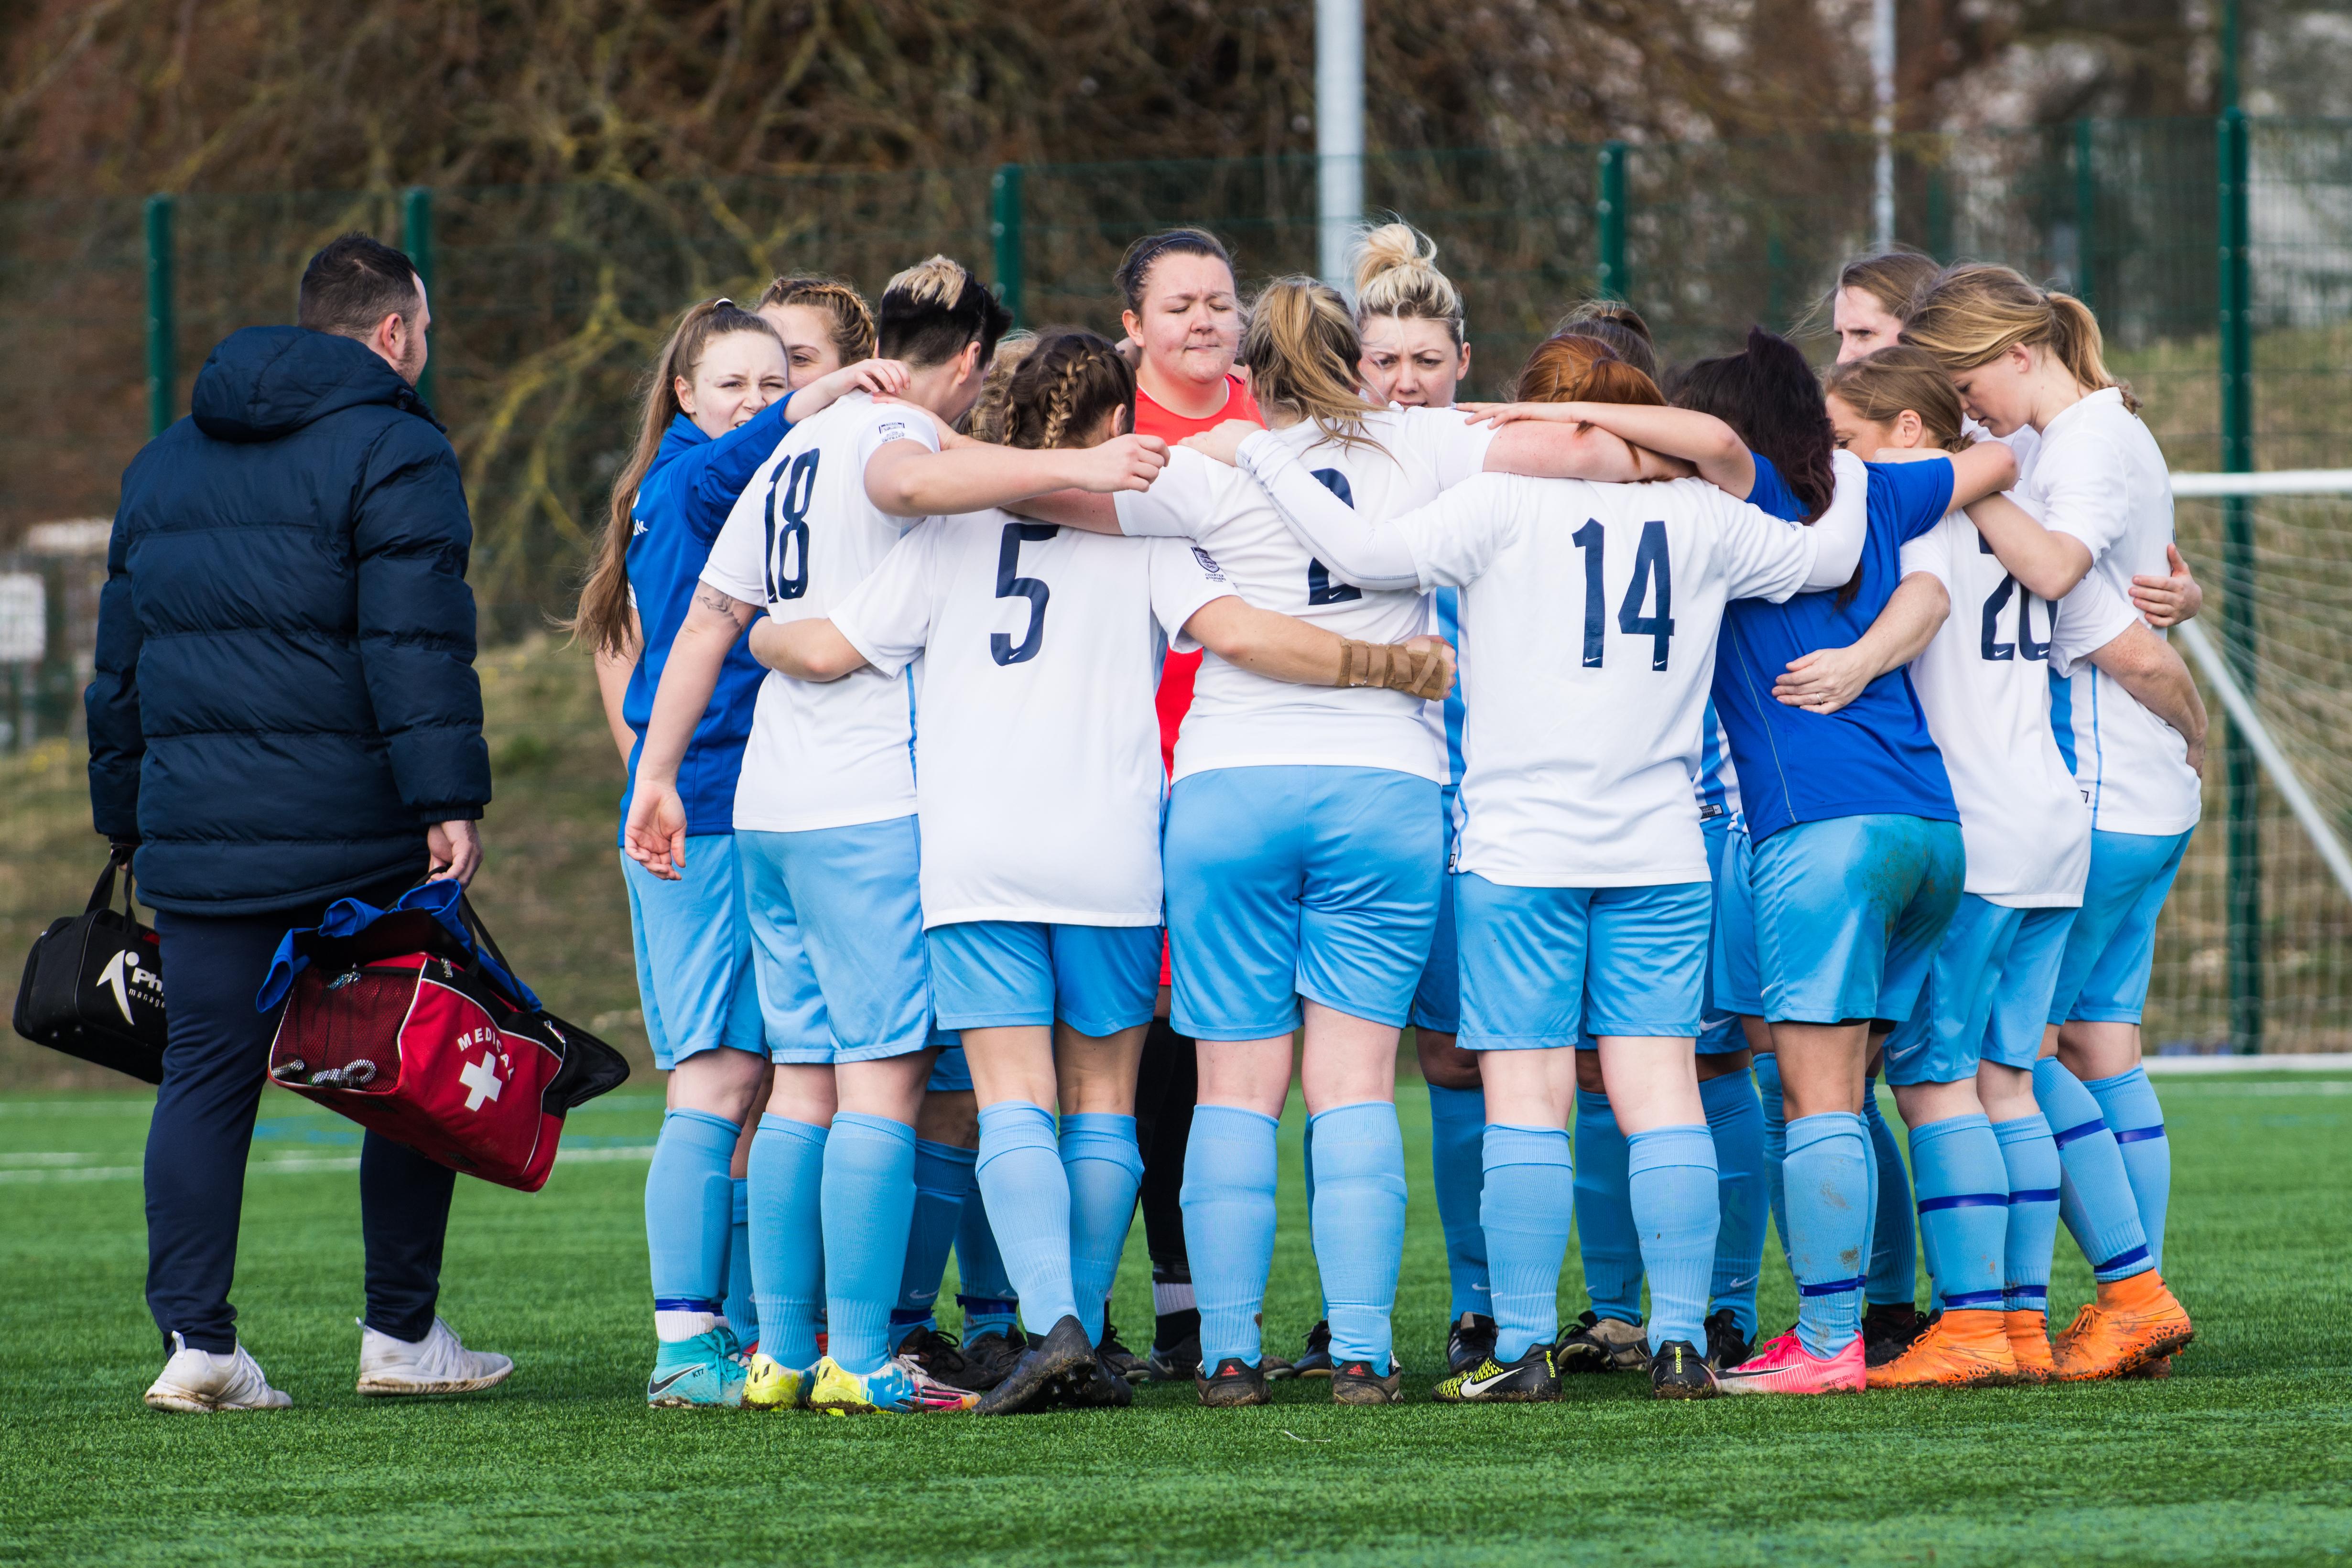 DAVID_JEFFERY Saltdean Utd Ladies FC vs Worthing Utd Ladies FC 11.03.18 02